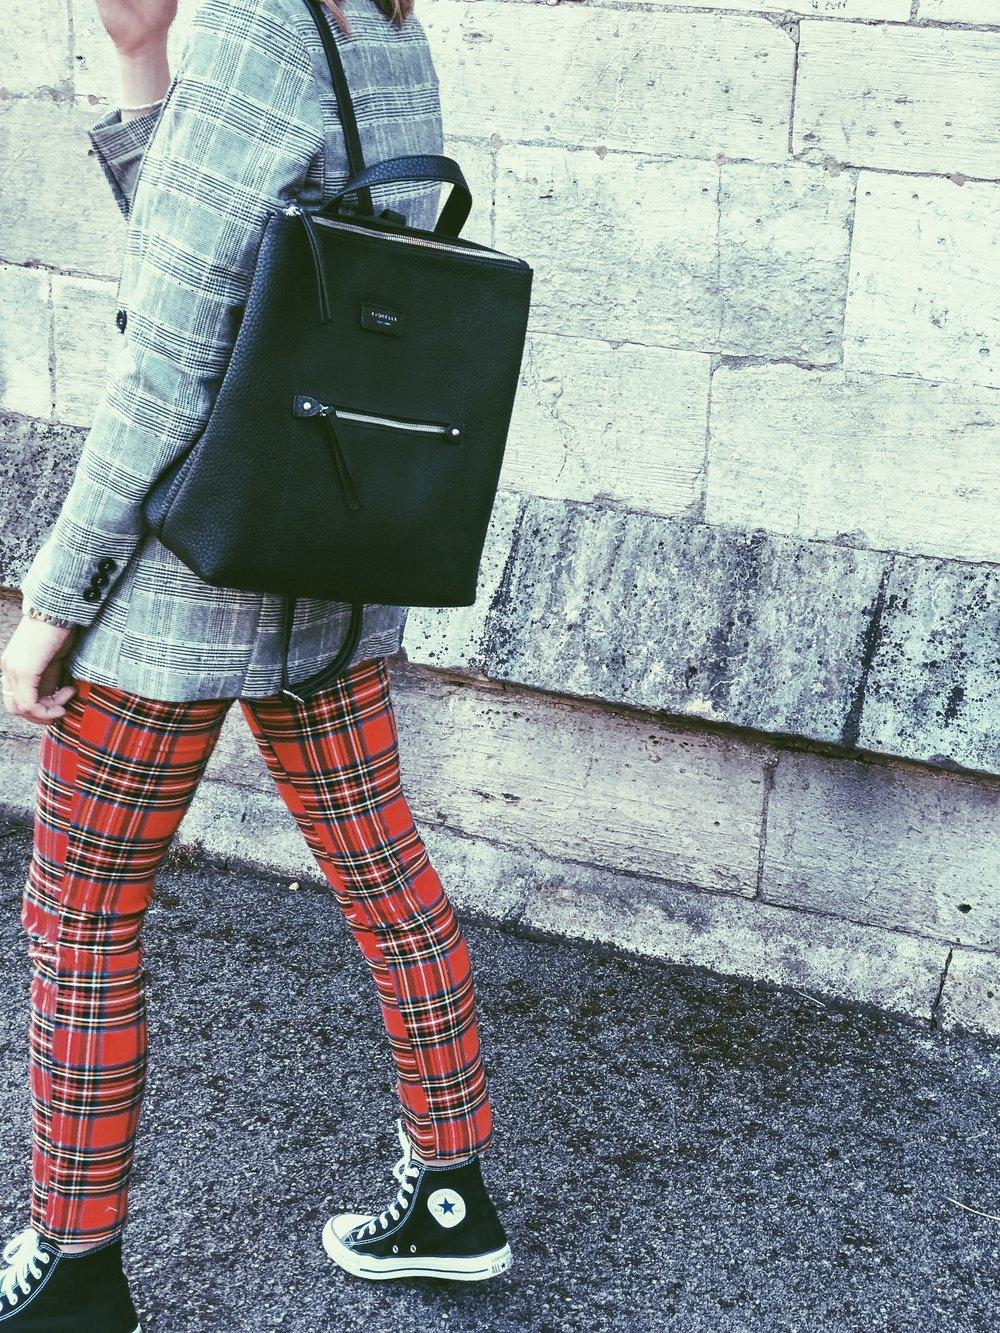 Blazer: H&M, Trouser: H&M, Bag: Fiorelli, Trainer: Converse